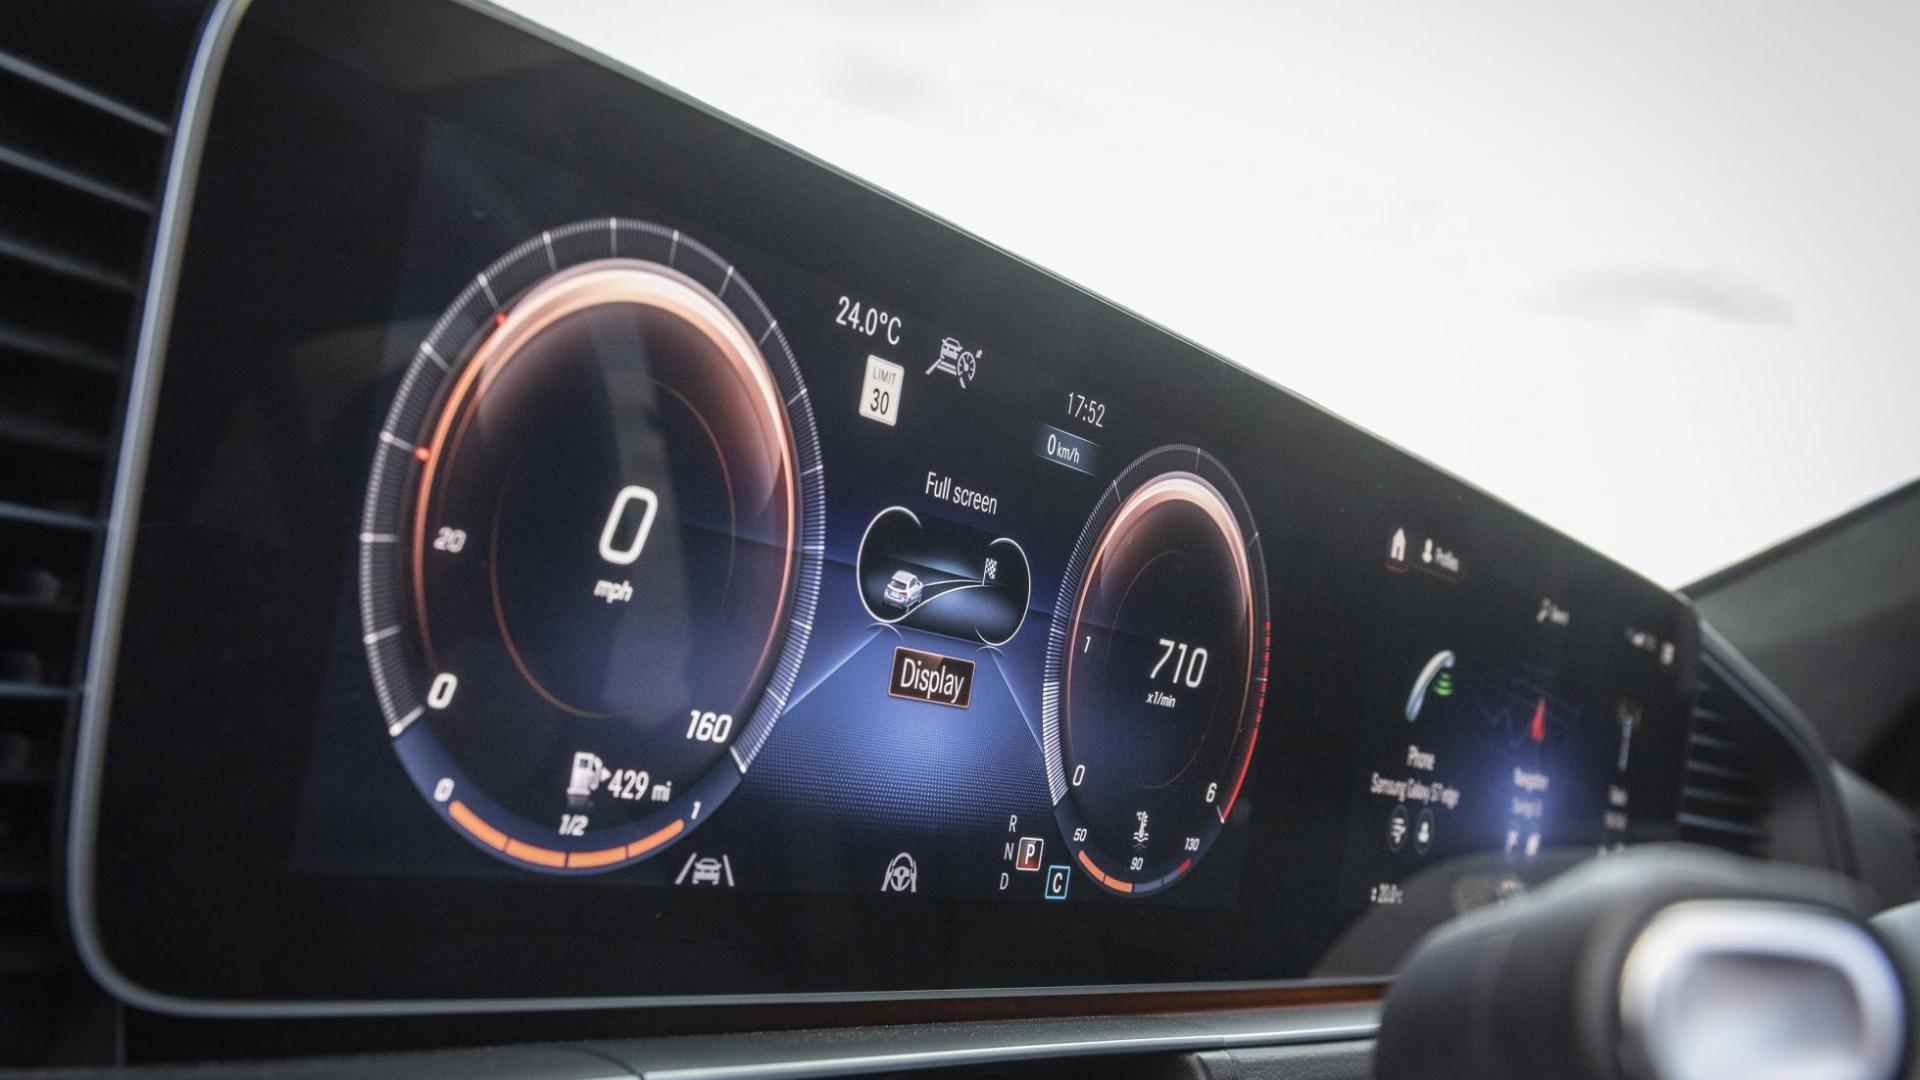 Mercedes-Benz GLE display